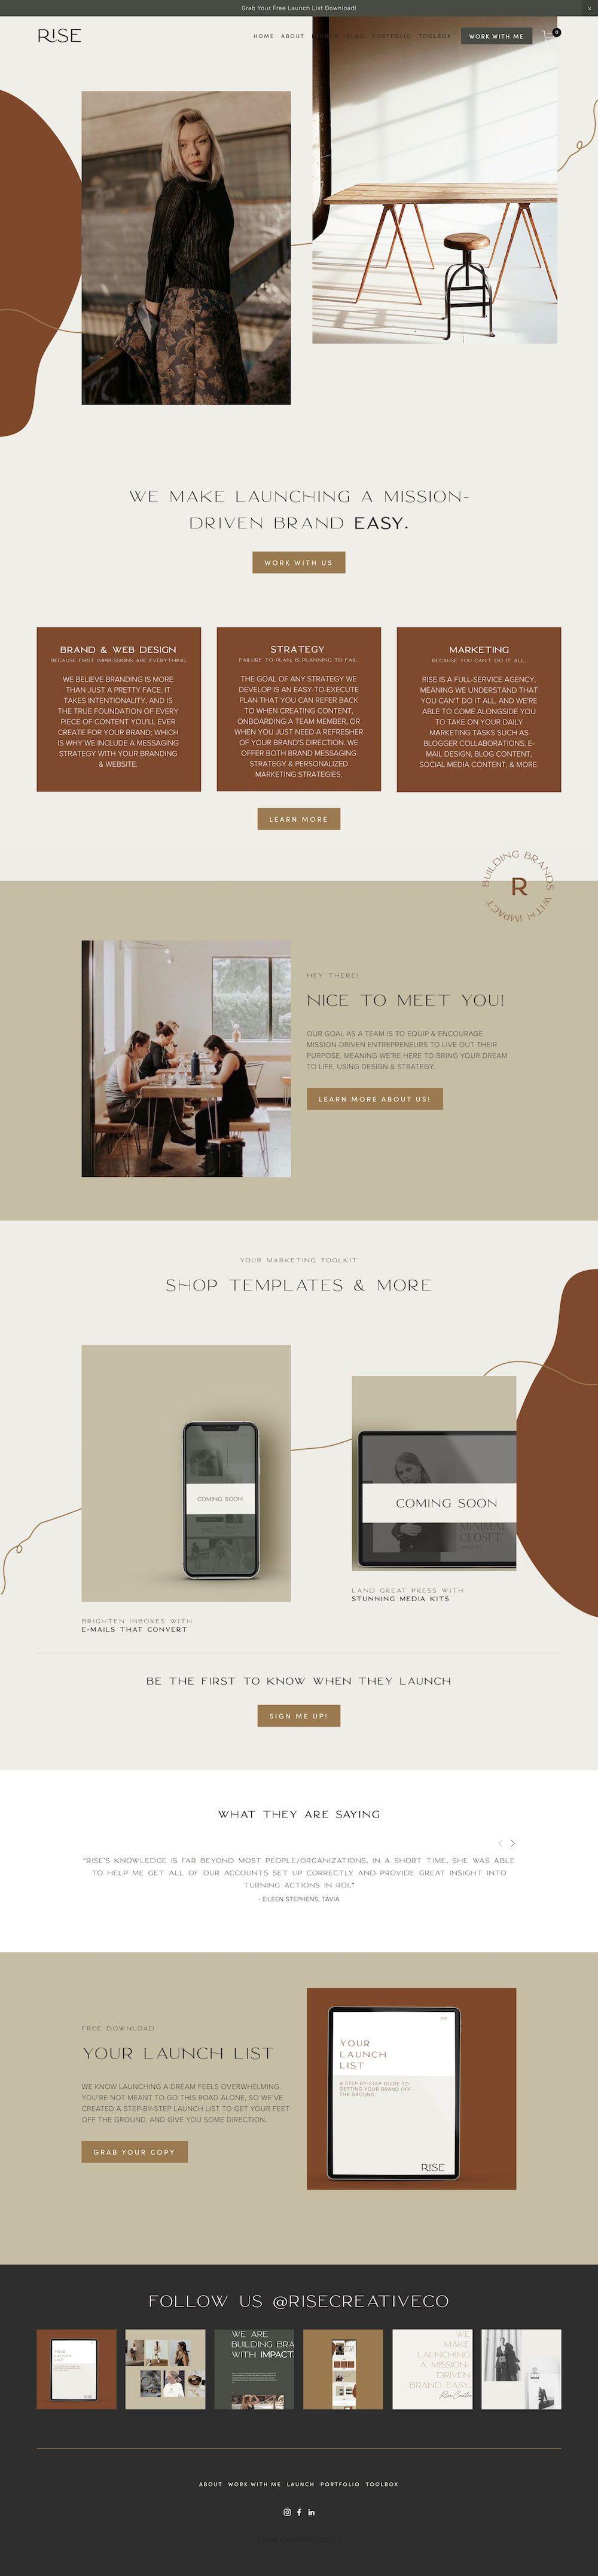 Nova Squarespace Template Kit Tutorials In 2020 Squarespace Templates Minimal Web Design Diy Web Design